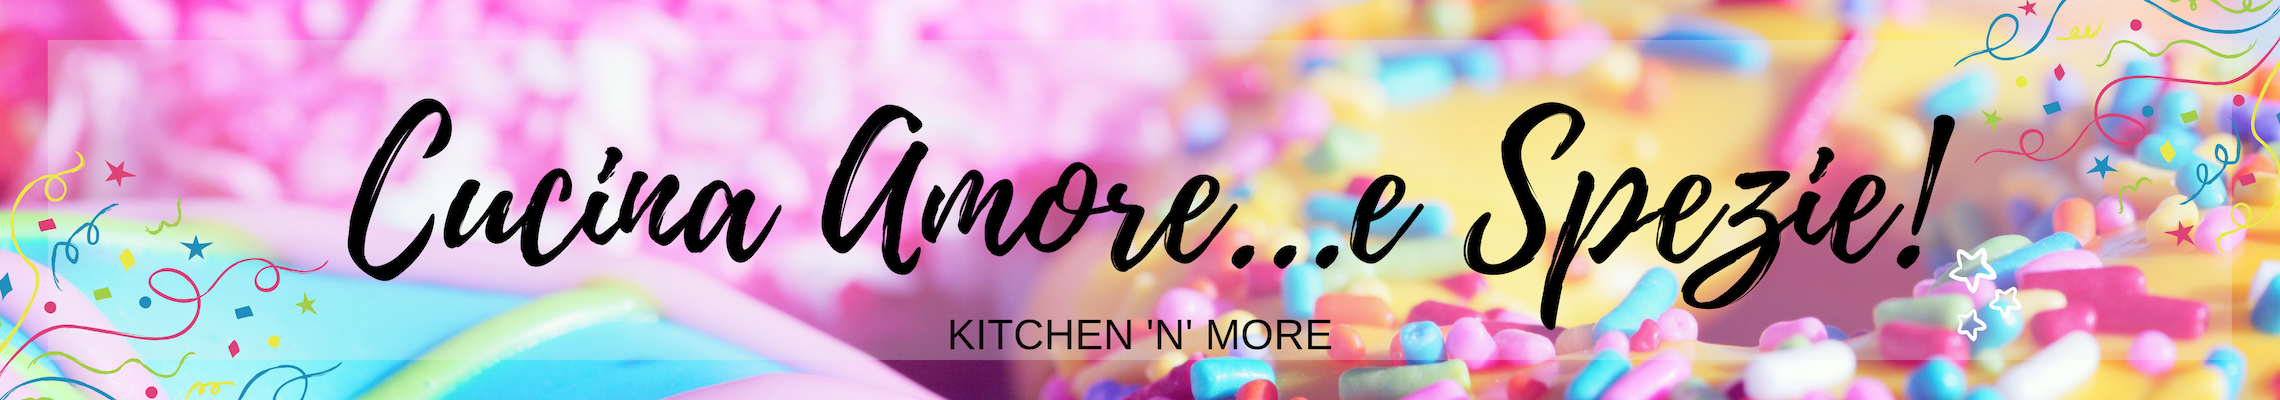 Cucina Amore…e Spezie!